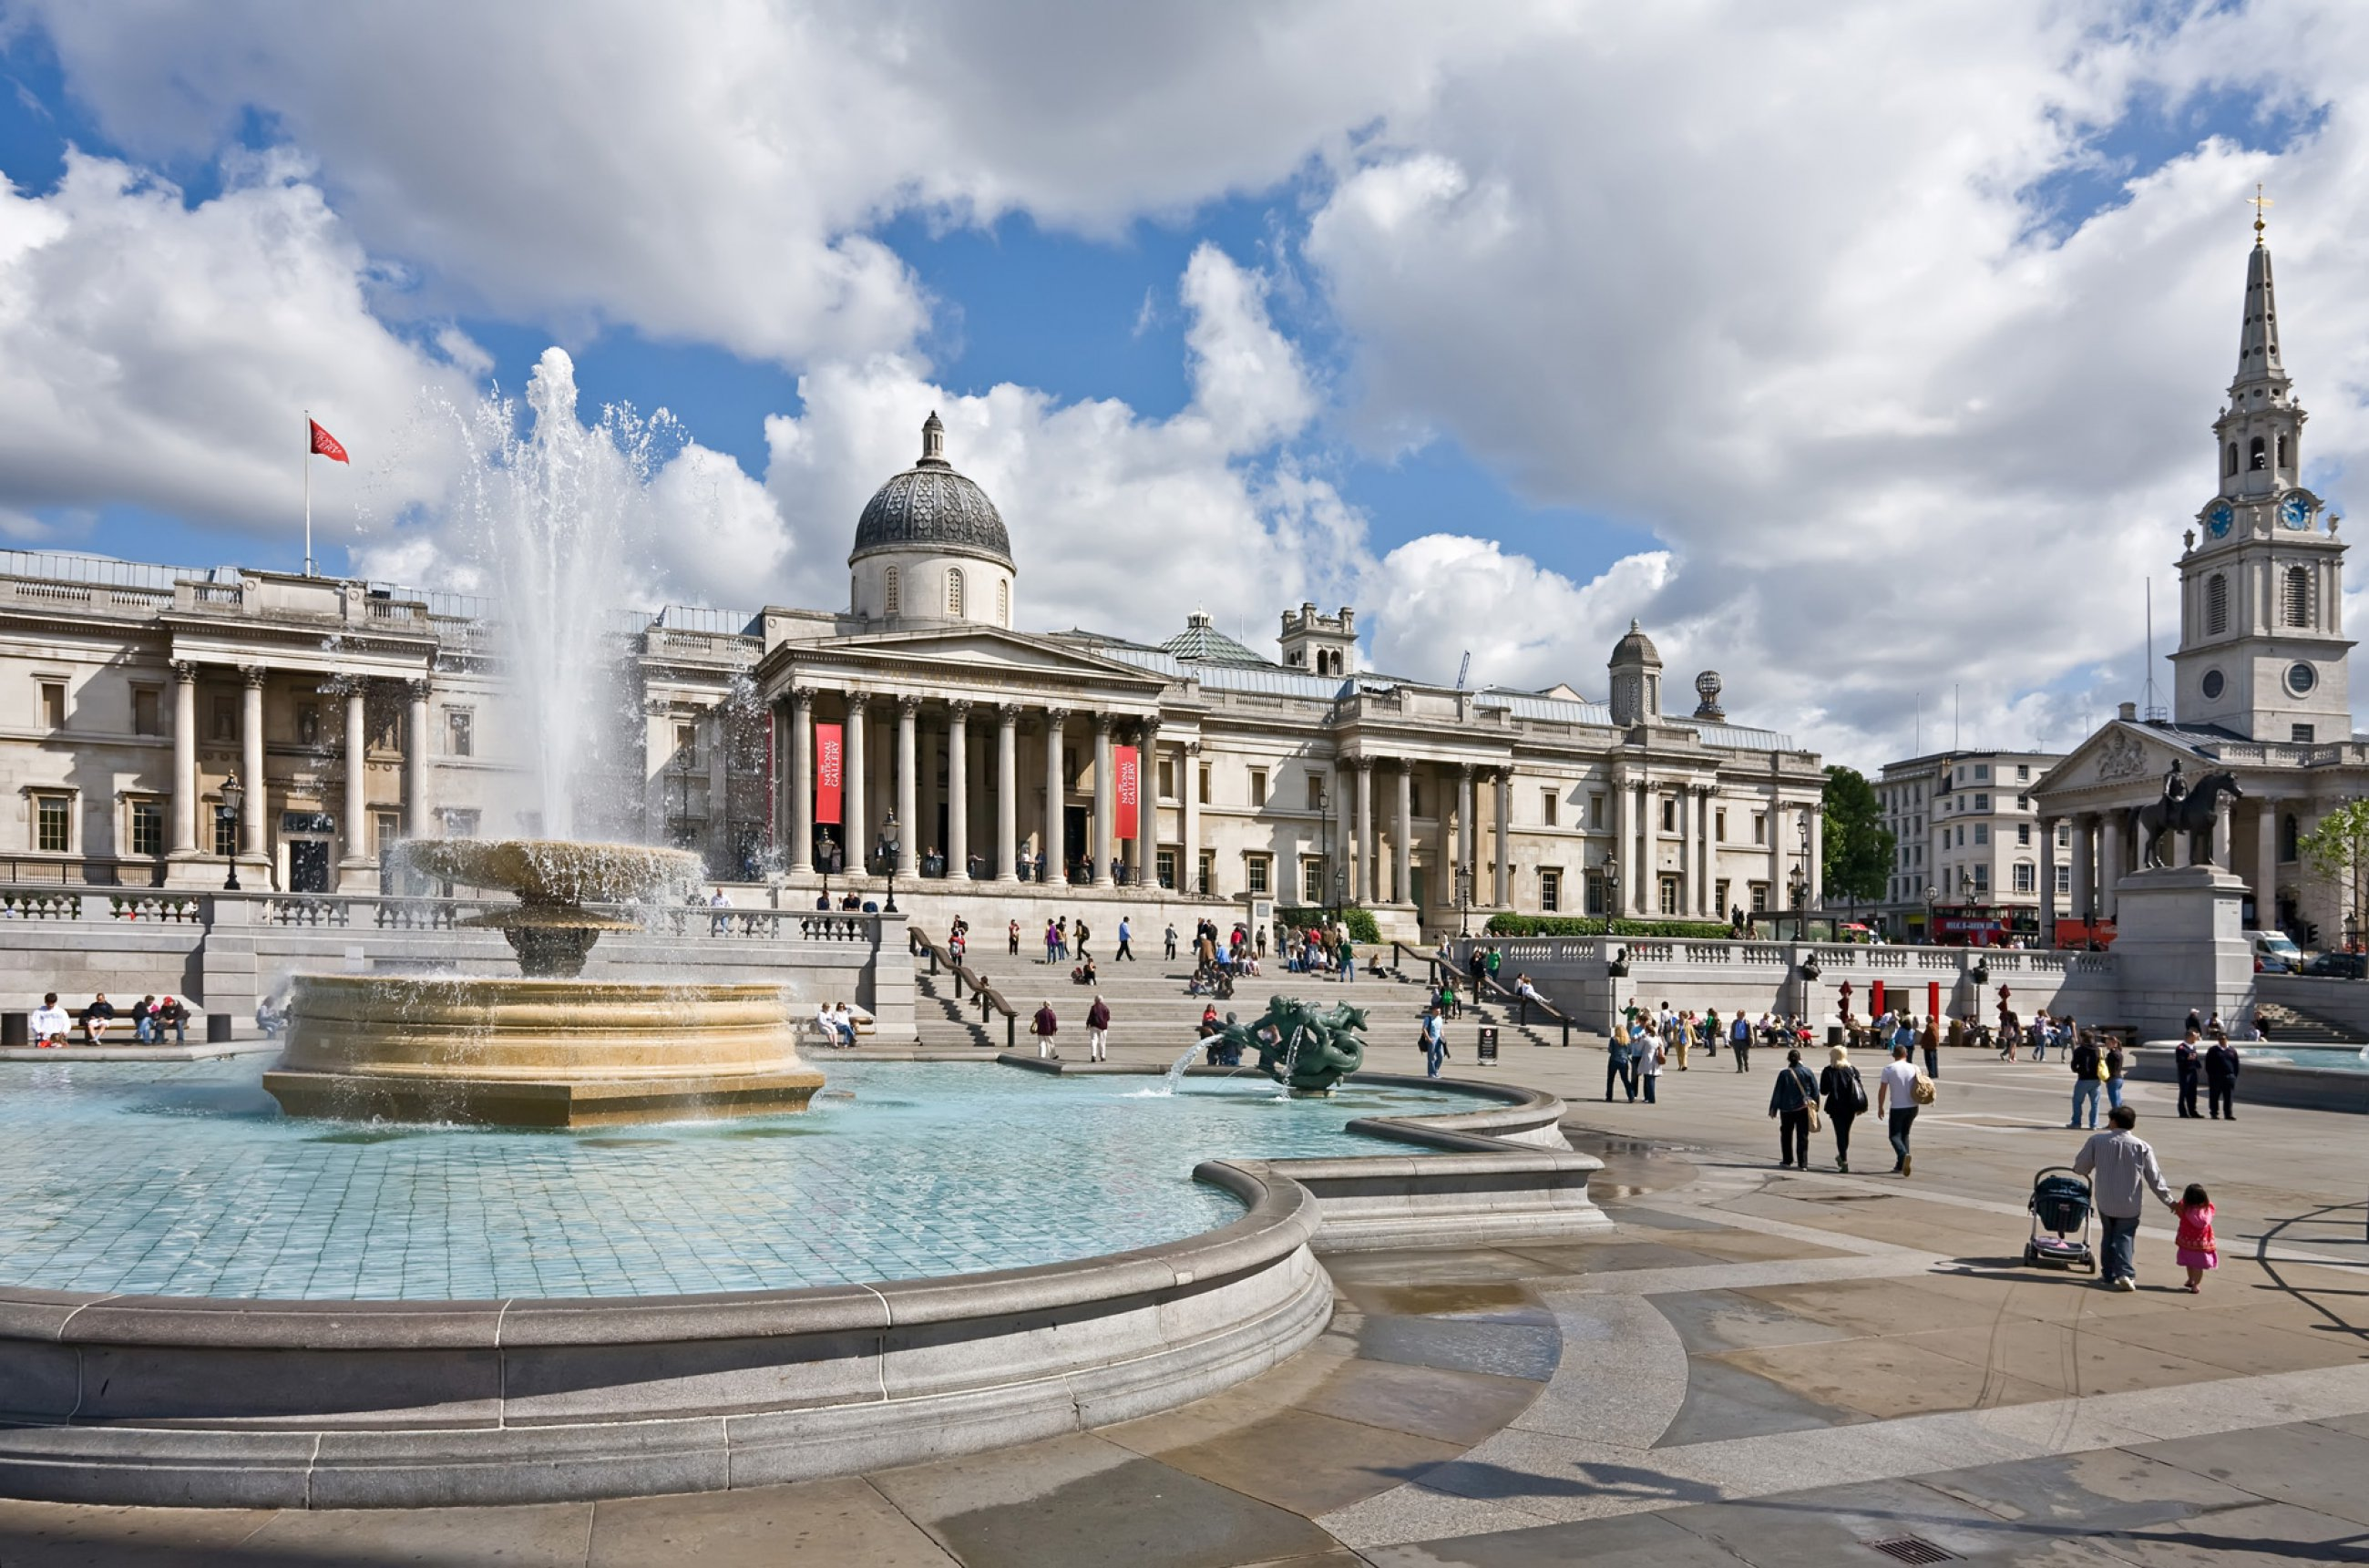 https://bubo.sk/uploads/galleries/5048/london-trafalgar-square-london-2-jun-2009.jpg